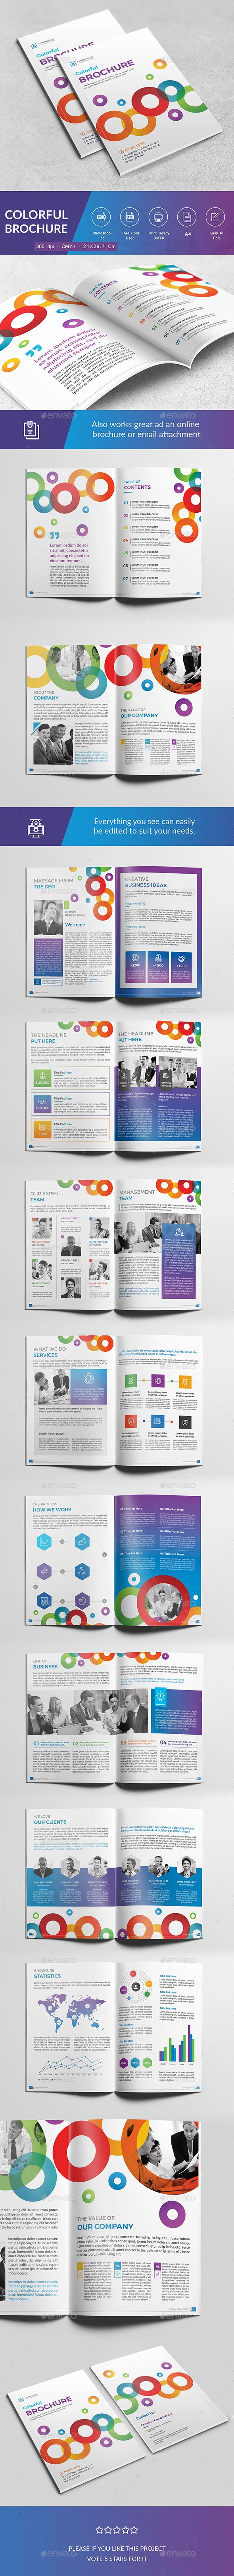 Colorful Brochure | Download: https://graphicriver.net/item/colorful-brochure/18709805?ref=sinzo #Corporate #Brochures